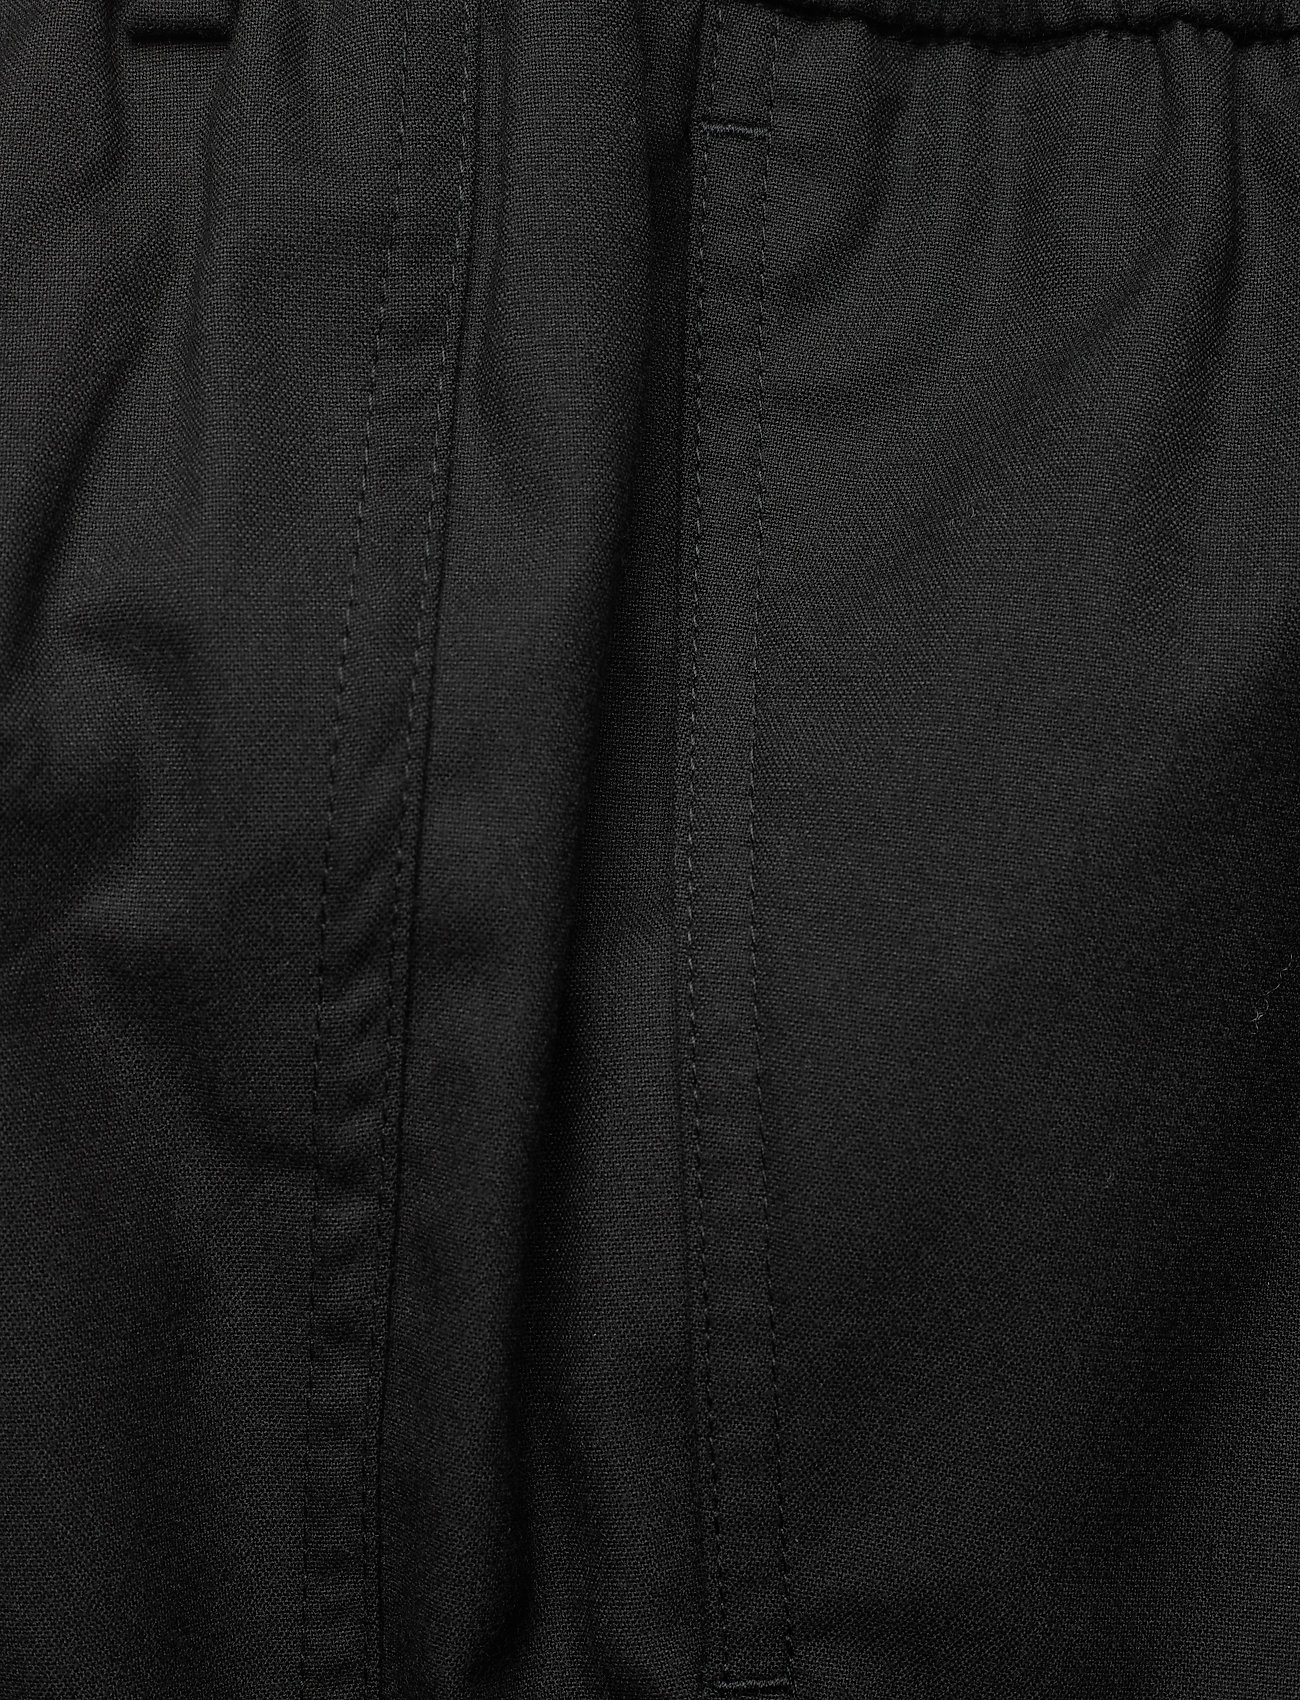 Flannel Tailored Jogger Pant (Calvin Black) (840 kr) - Calvin Klein